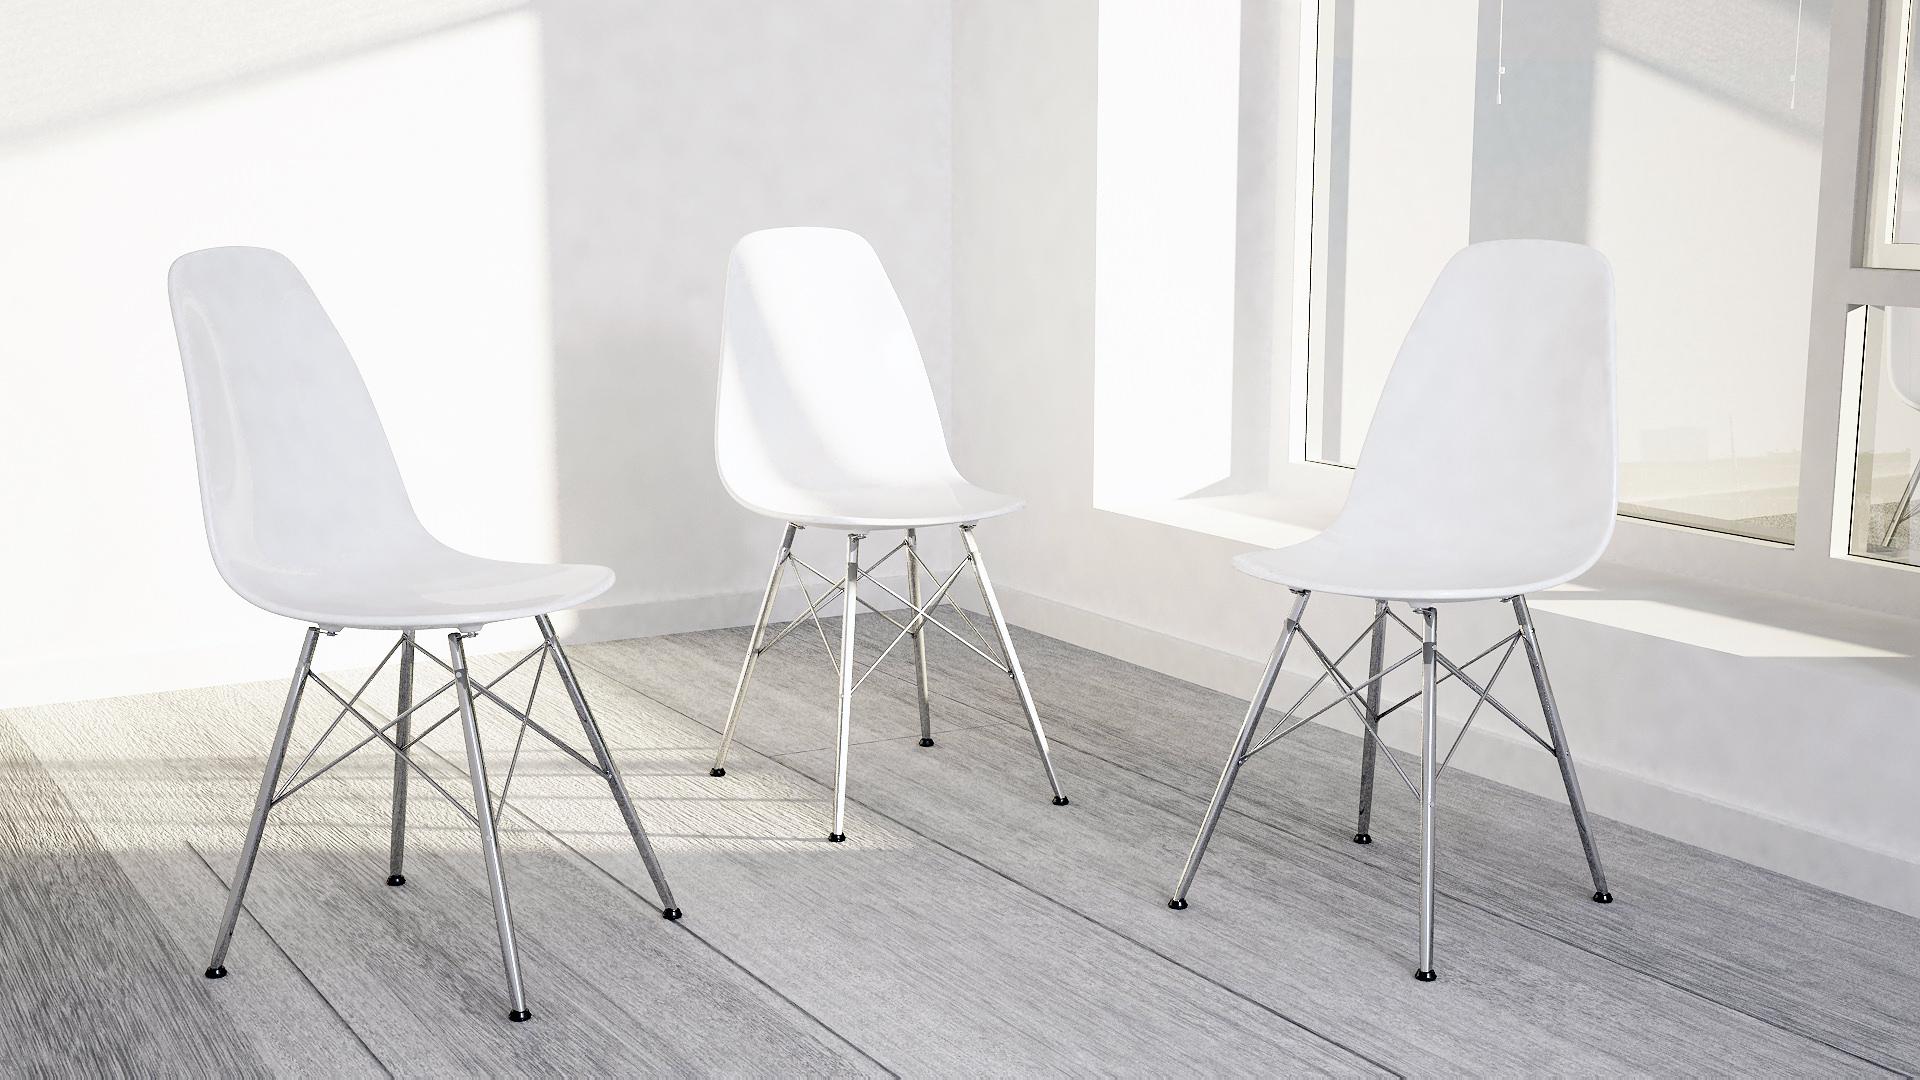 ... Eames Design Chair White 3d Model Max Obj 3ds Fbx Dxf Dwg 2 ...